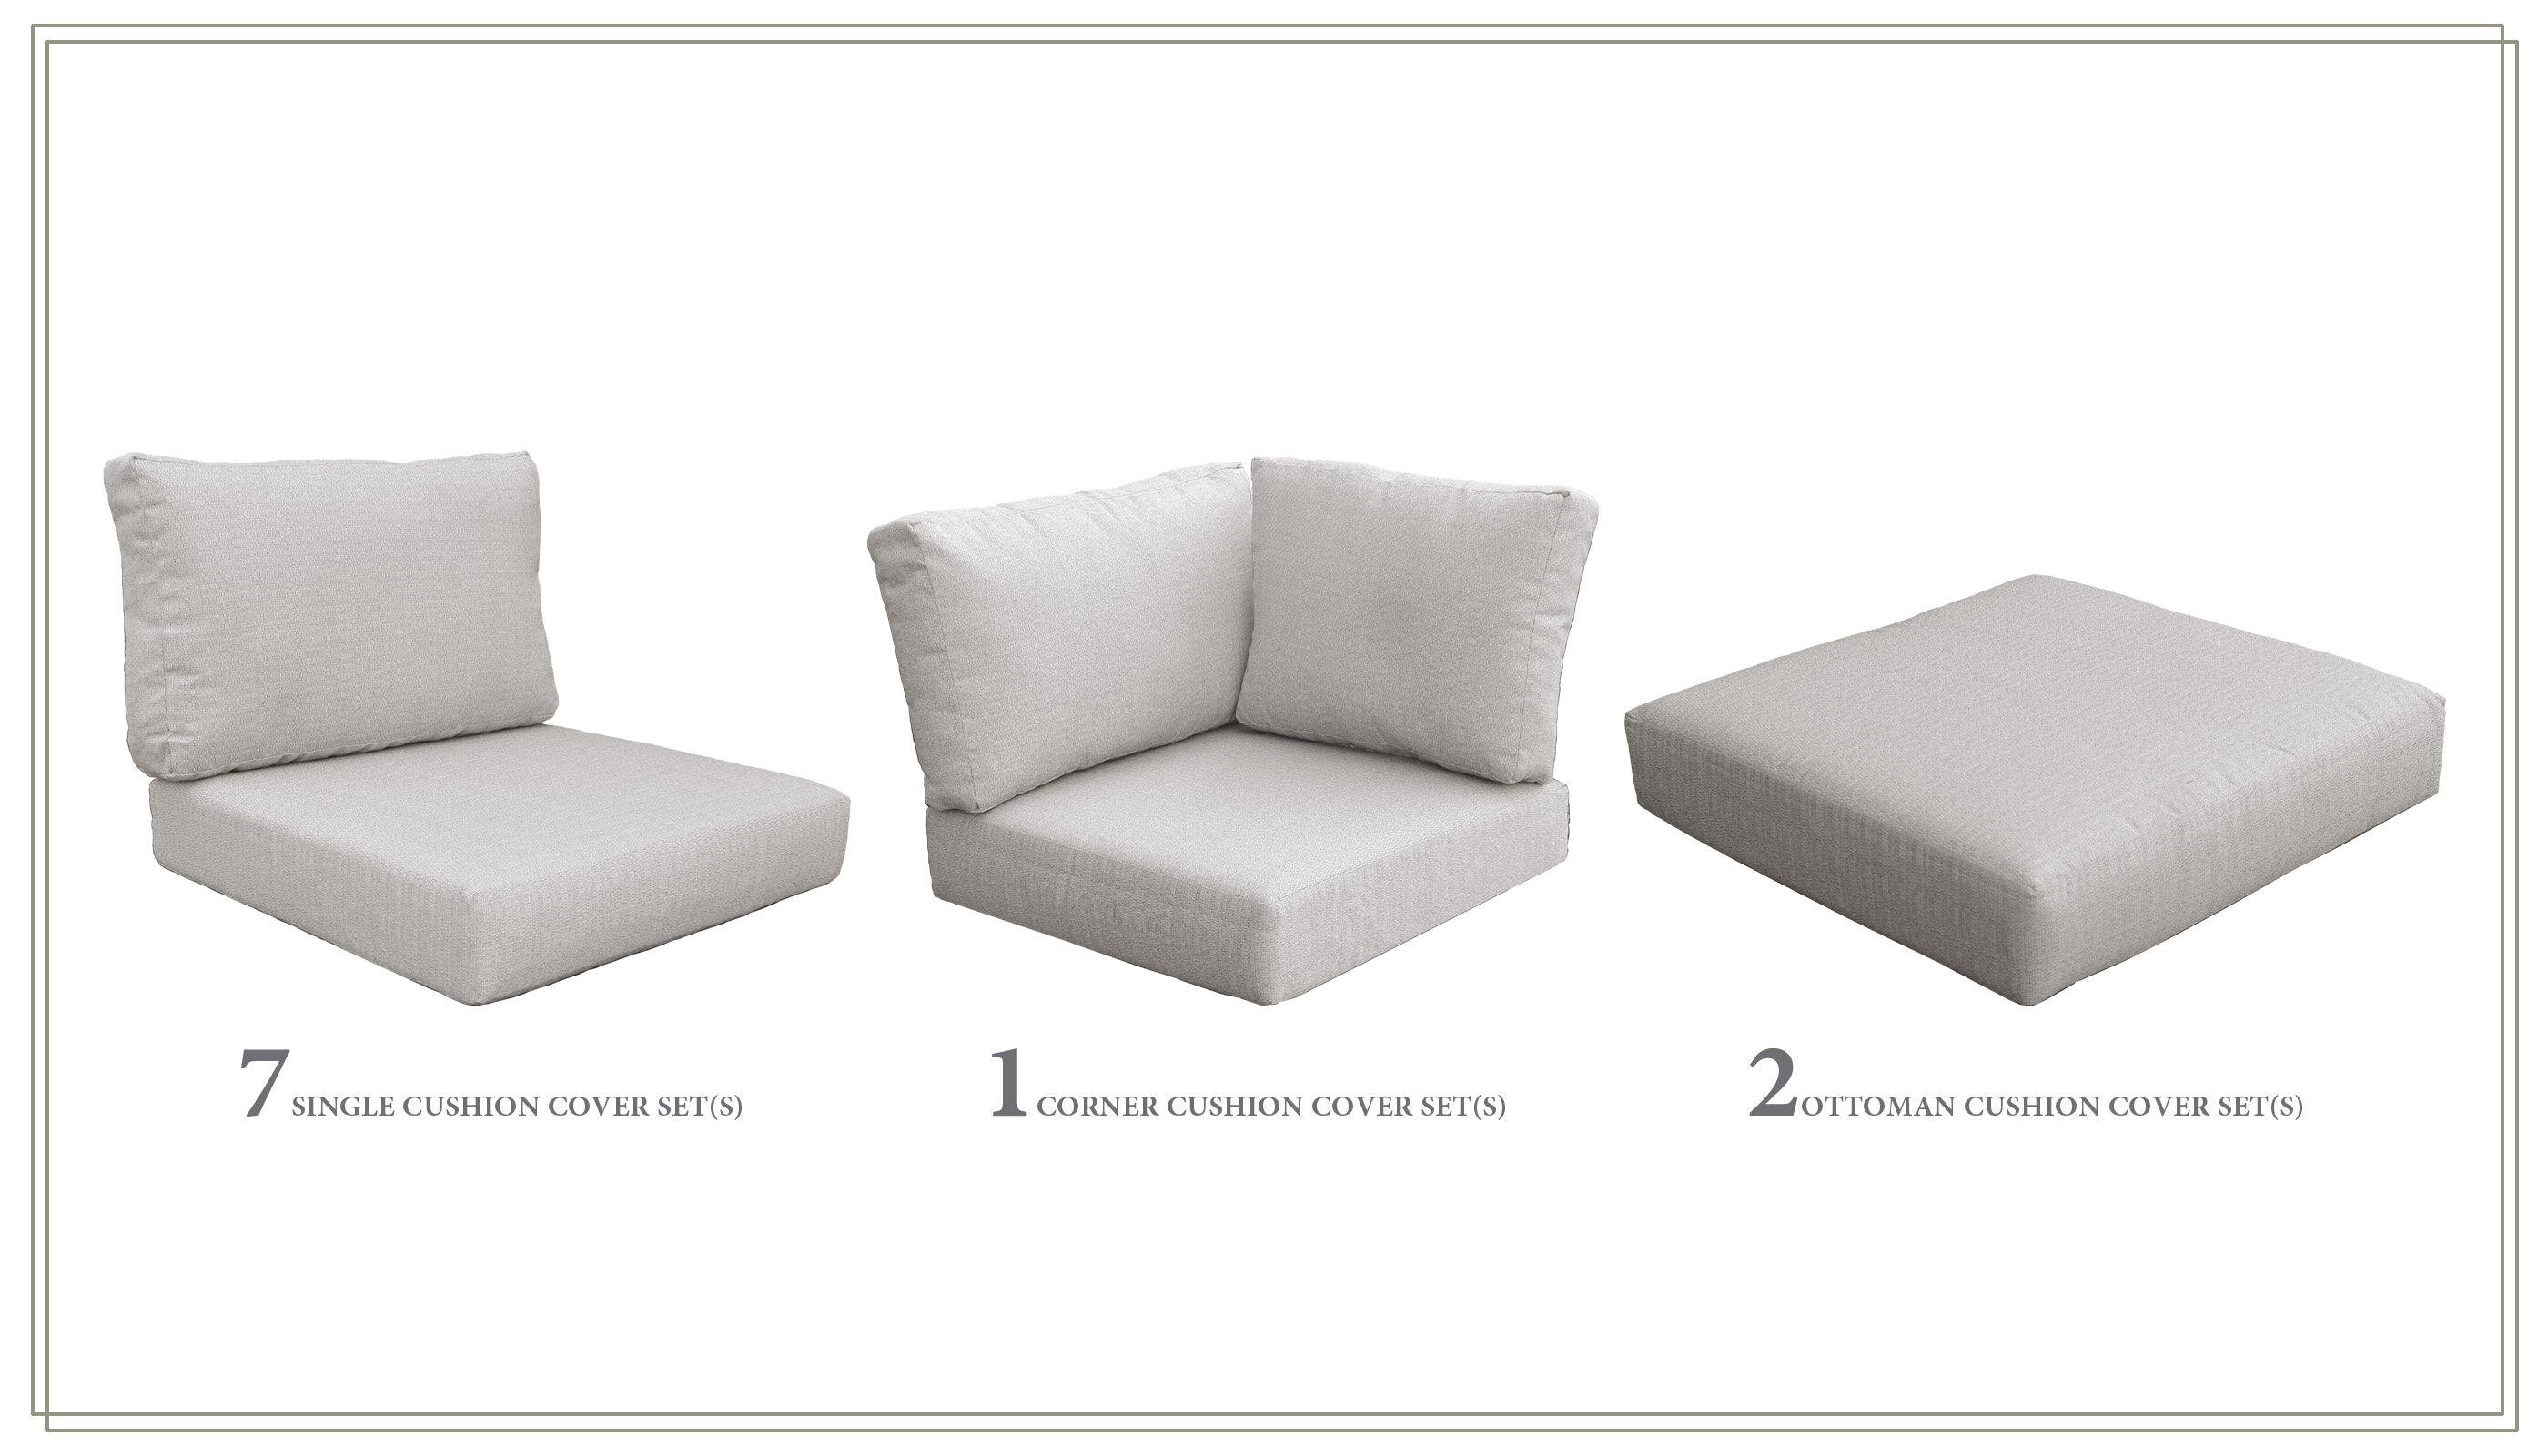 sol 72 outdoor 19 piece indooroutdoor lounge chair cushion set w